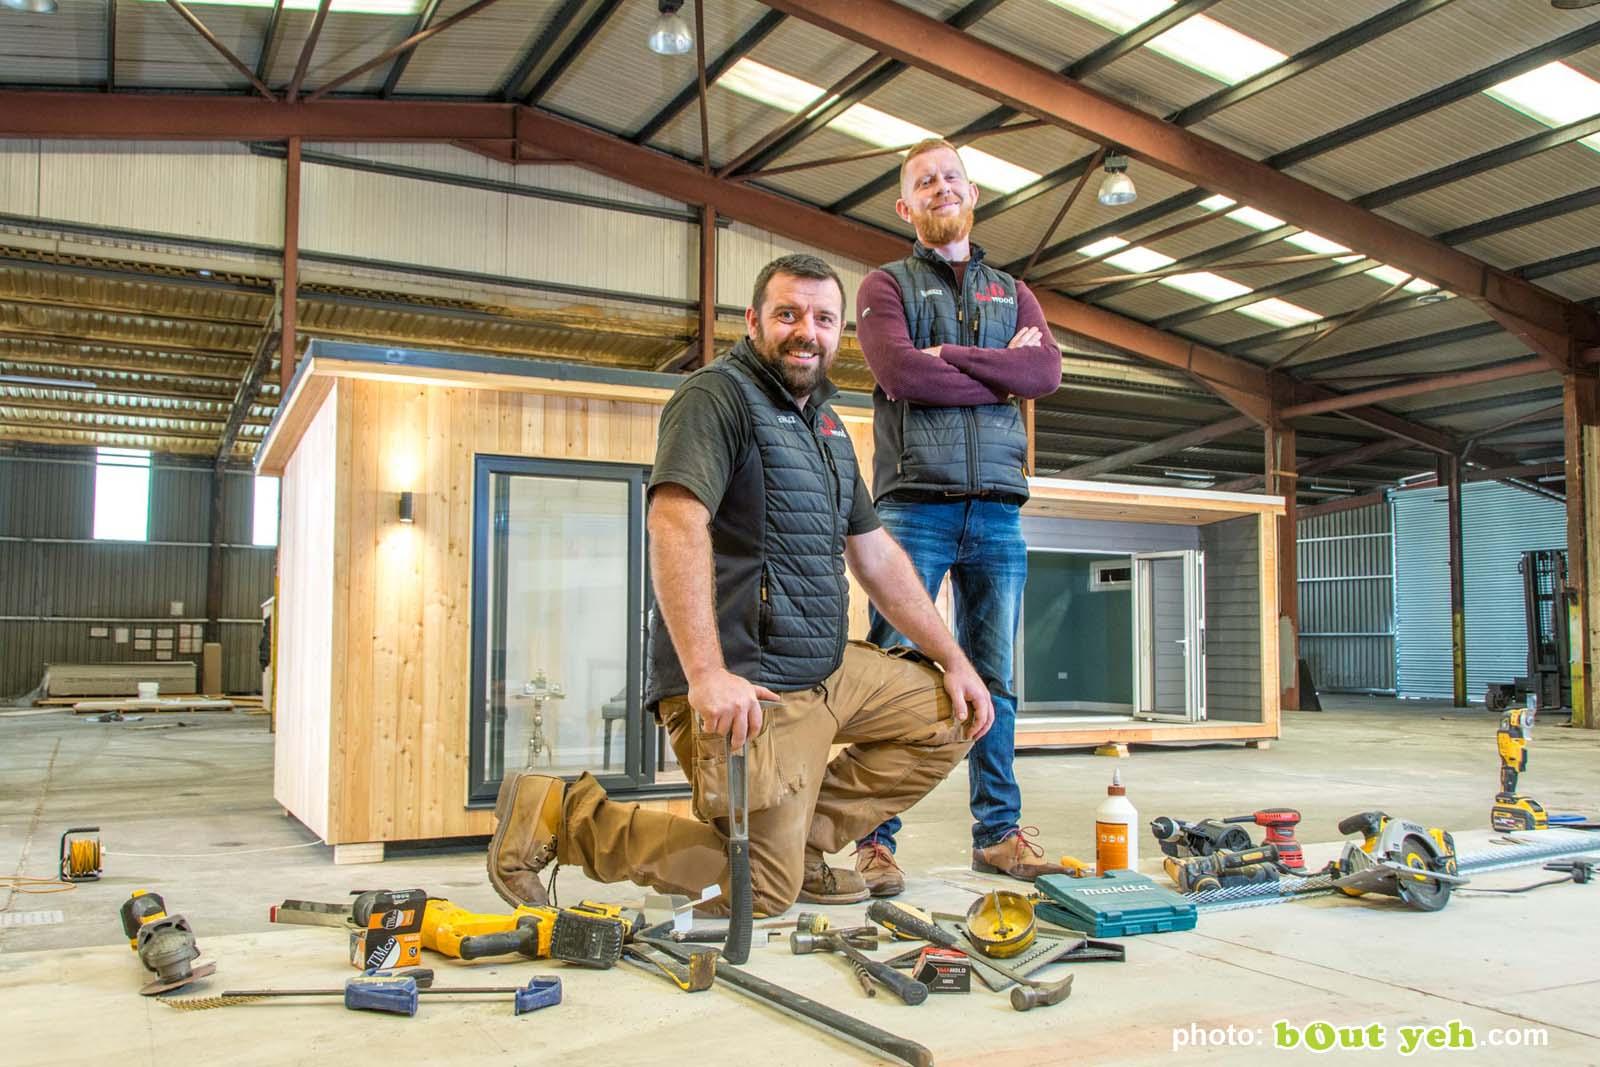 Social media marketing photo 2096 for Redwood NI by Bout Yeh social media marketing Belfast and Northern Ireland